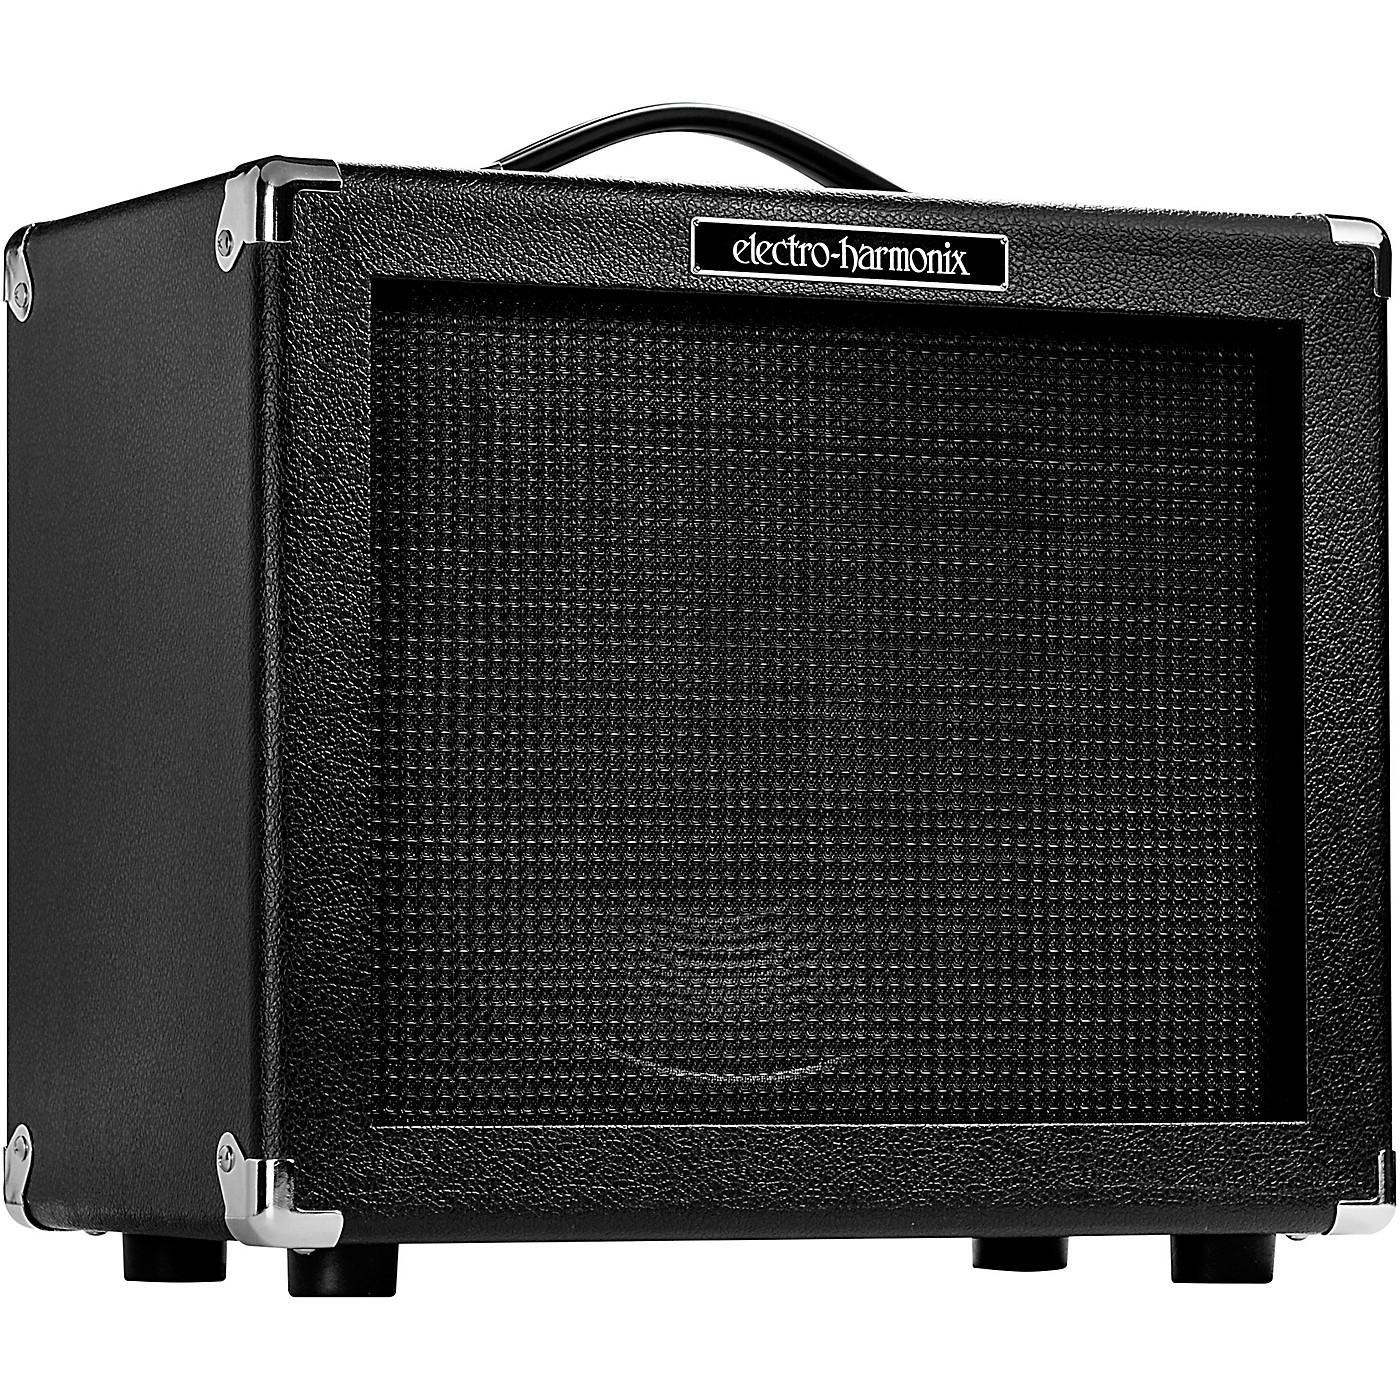 Electro-Harmonix Dirt Road Special 50W 1x12 Guitar Combo Amp thumbnail